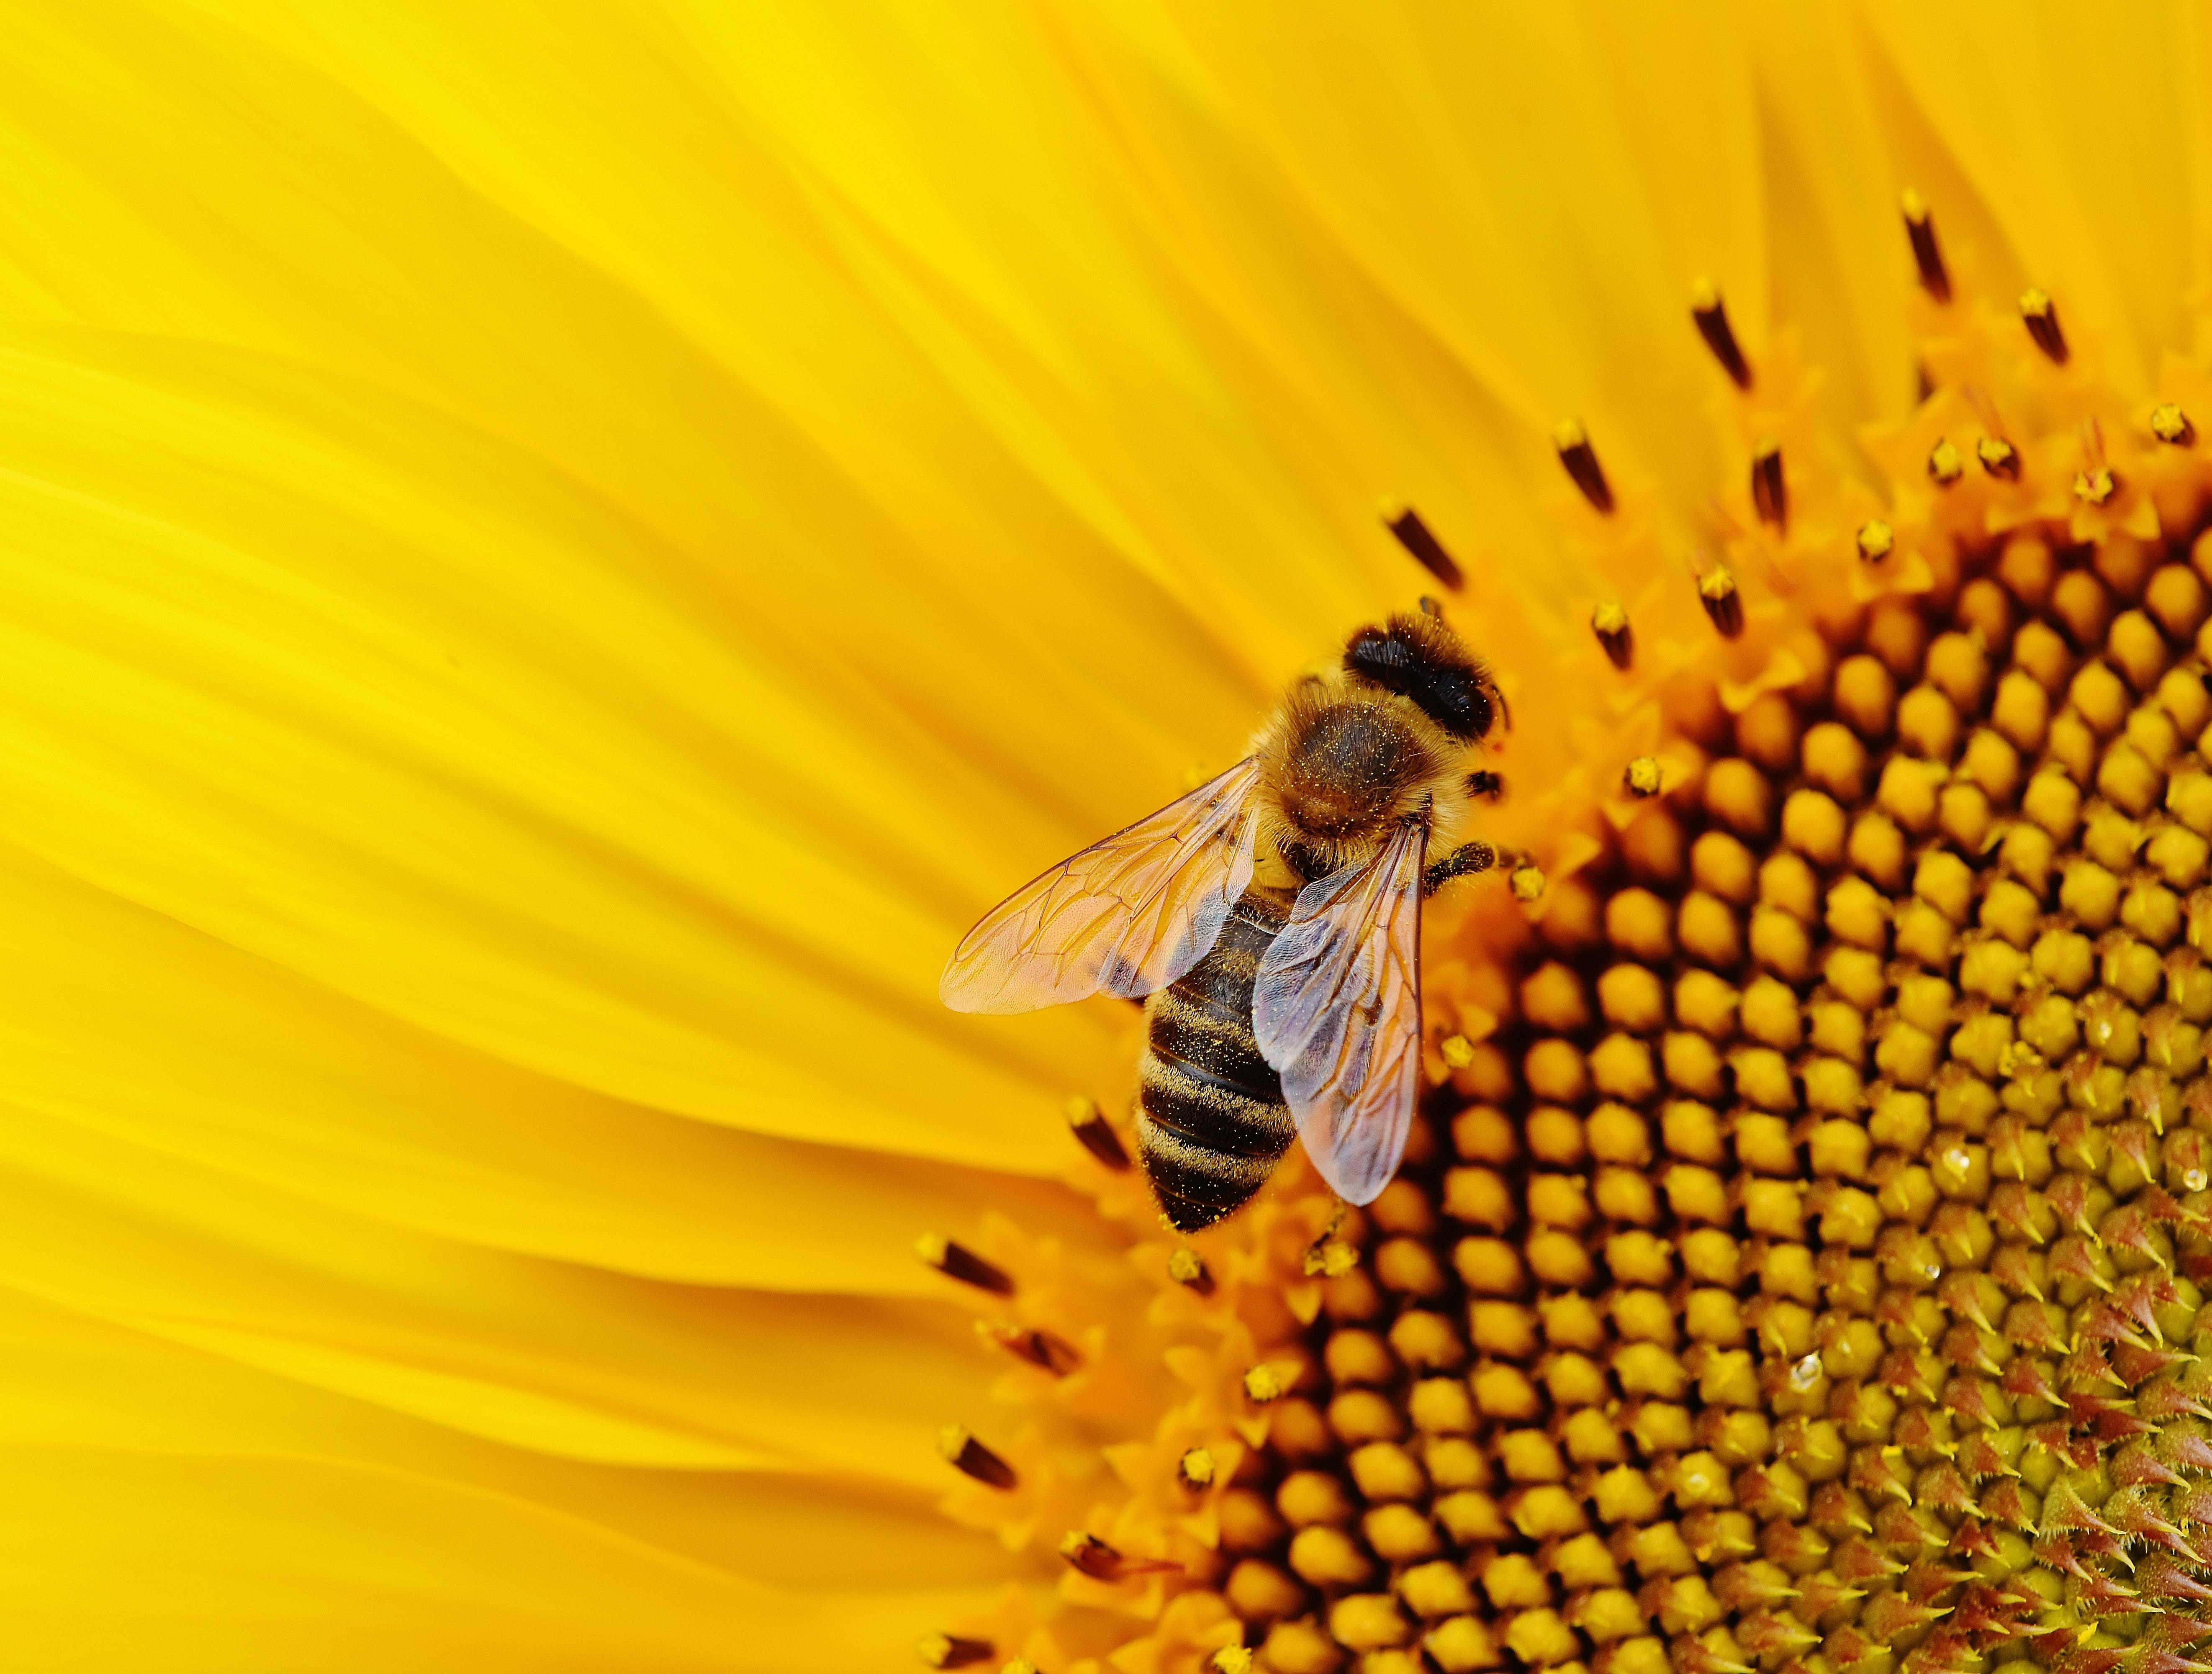 free images nature blossom petal bloom summer pollen pollination yellow garden flora. Black Bedroom Furniture Sets. Home Design Ideas